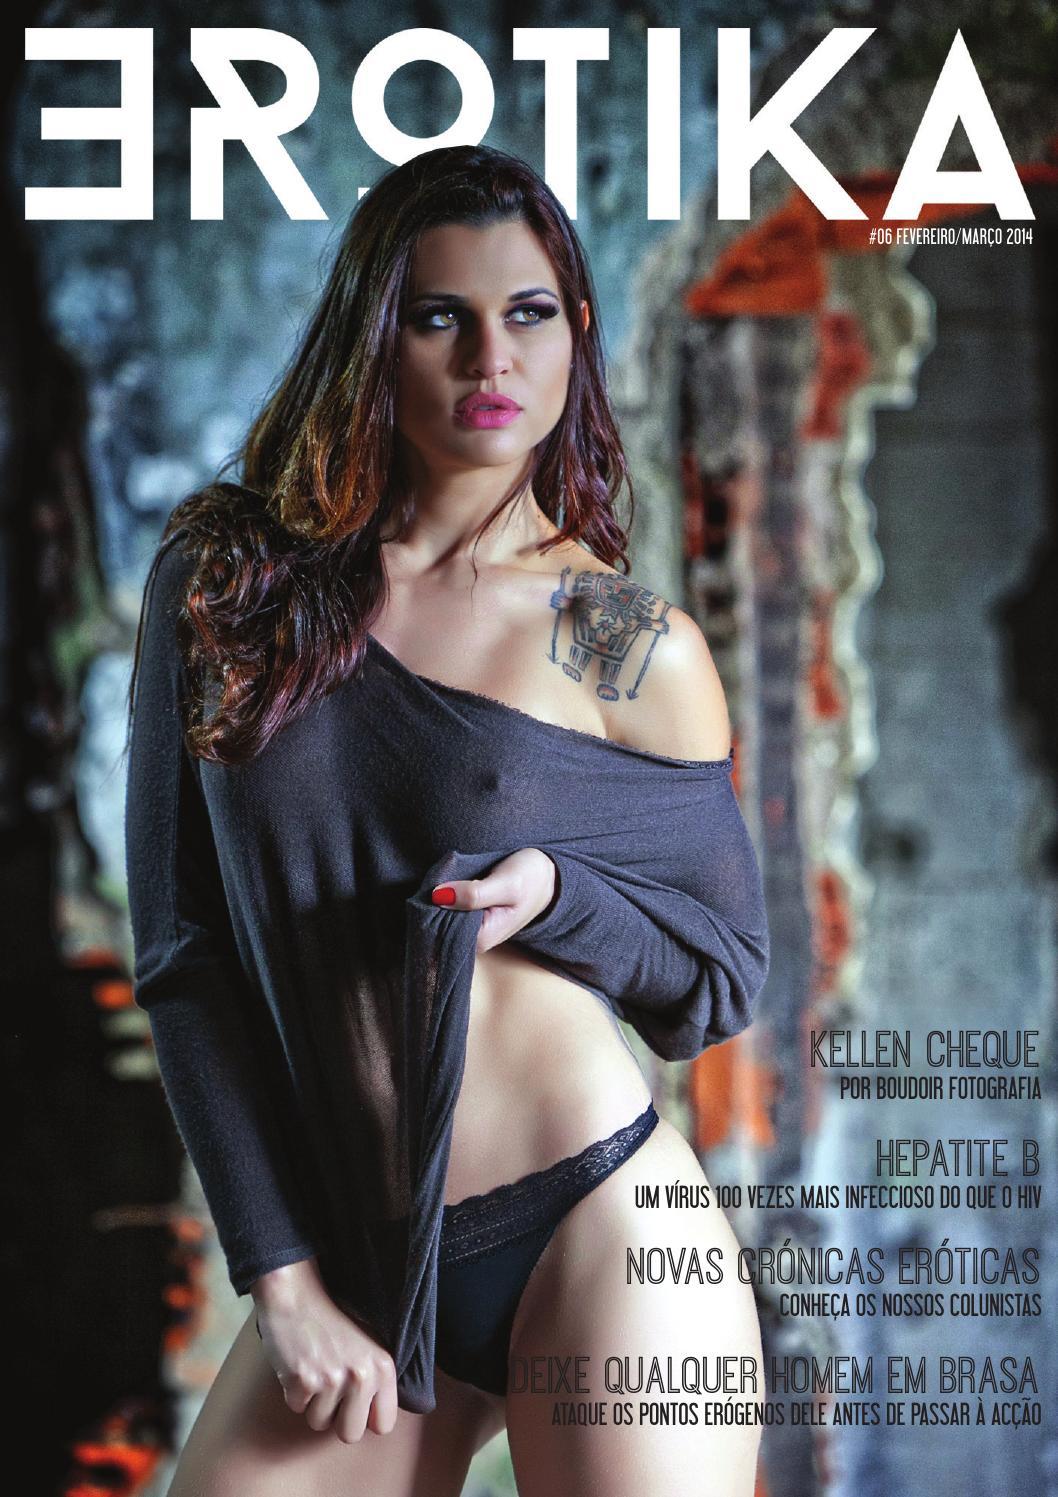 Revista Erotika Portugal Fotos Kellen Cheque